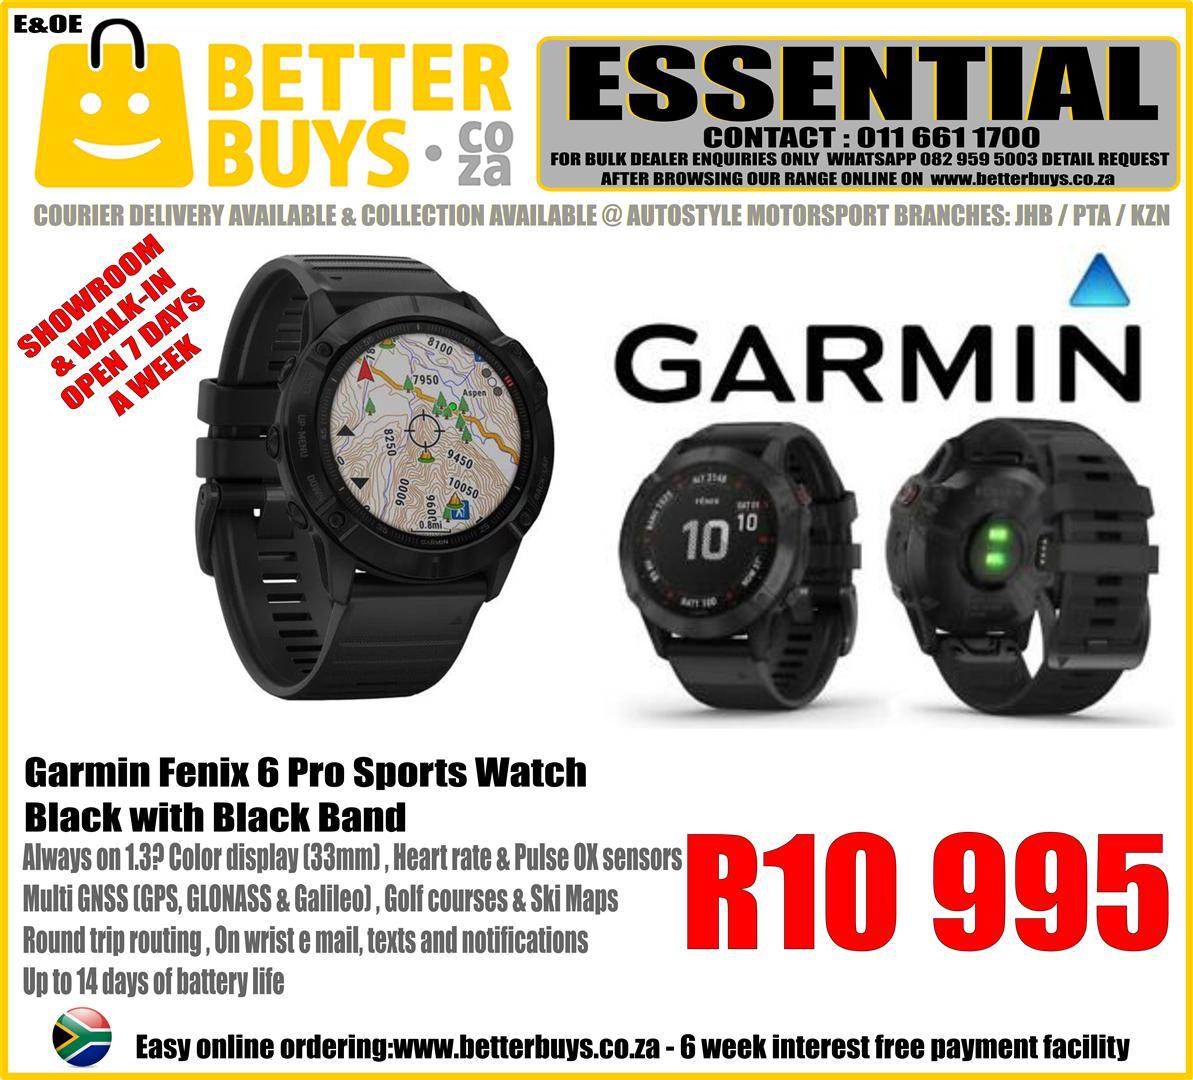 Garmin Fenix 6 Pro Sports Watch – Black with Black Band